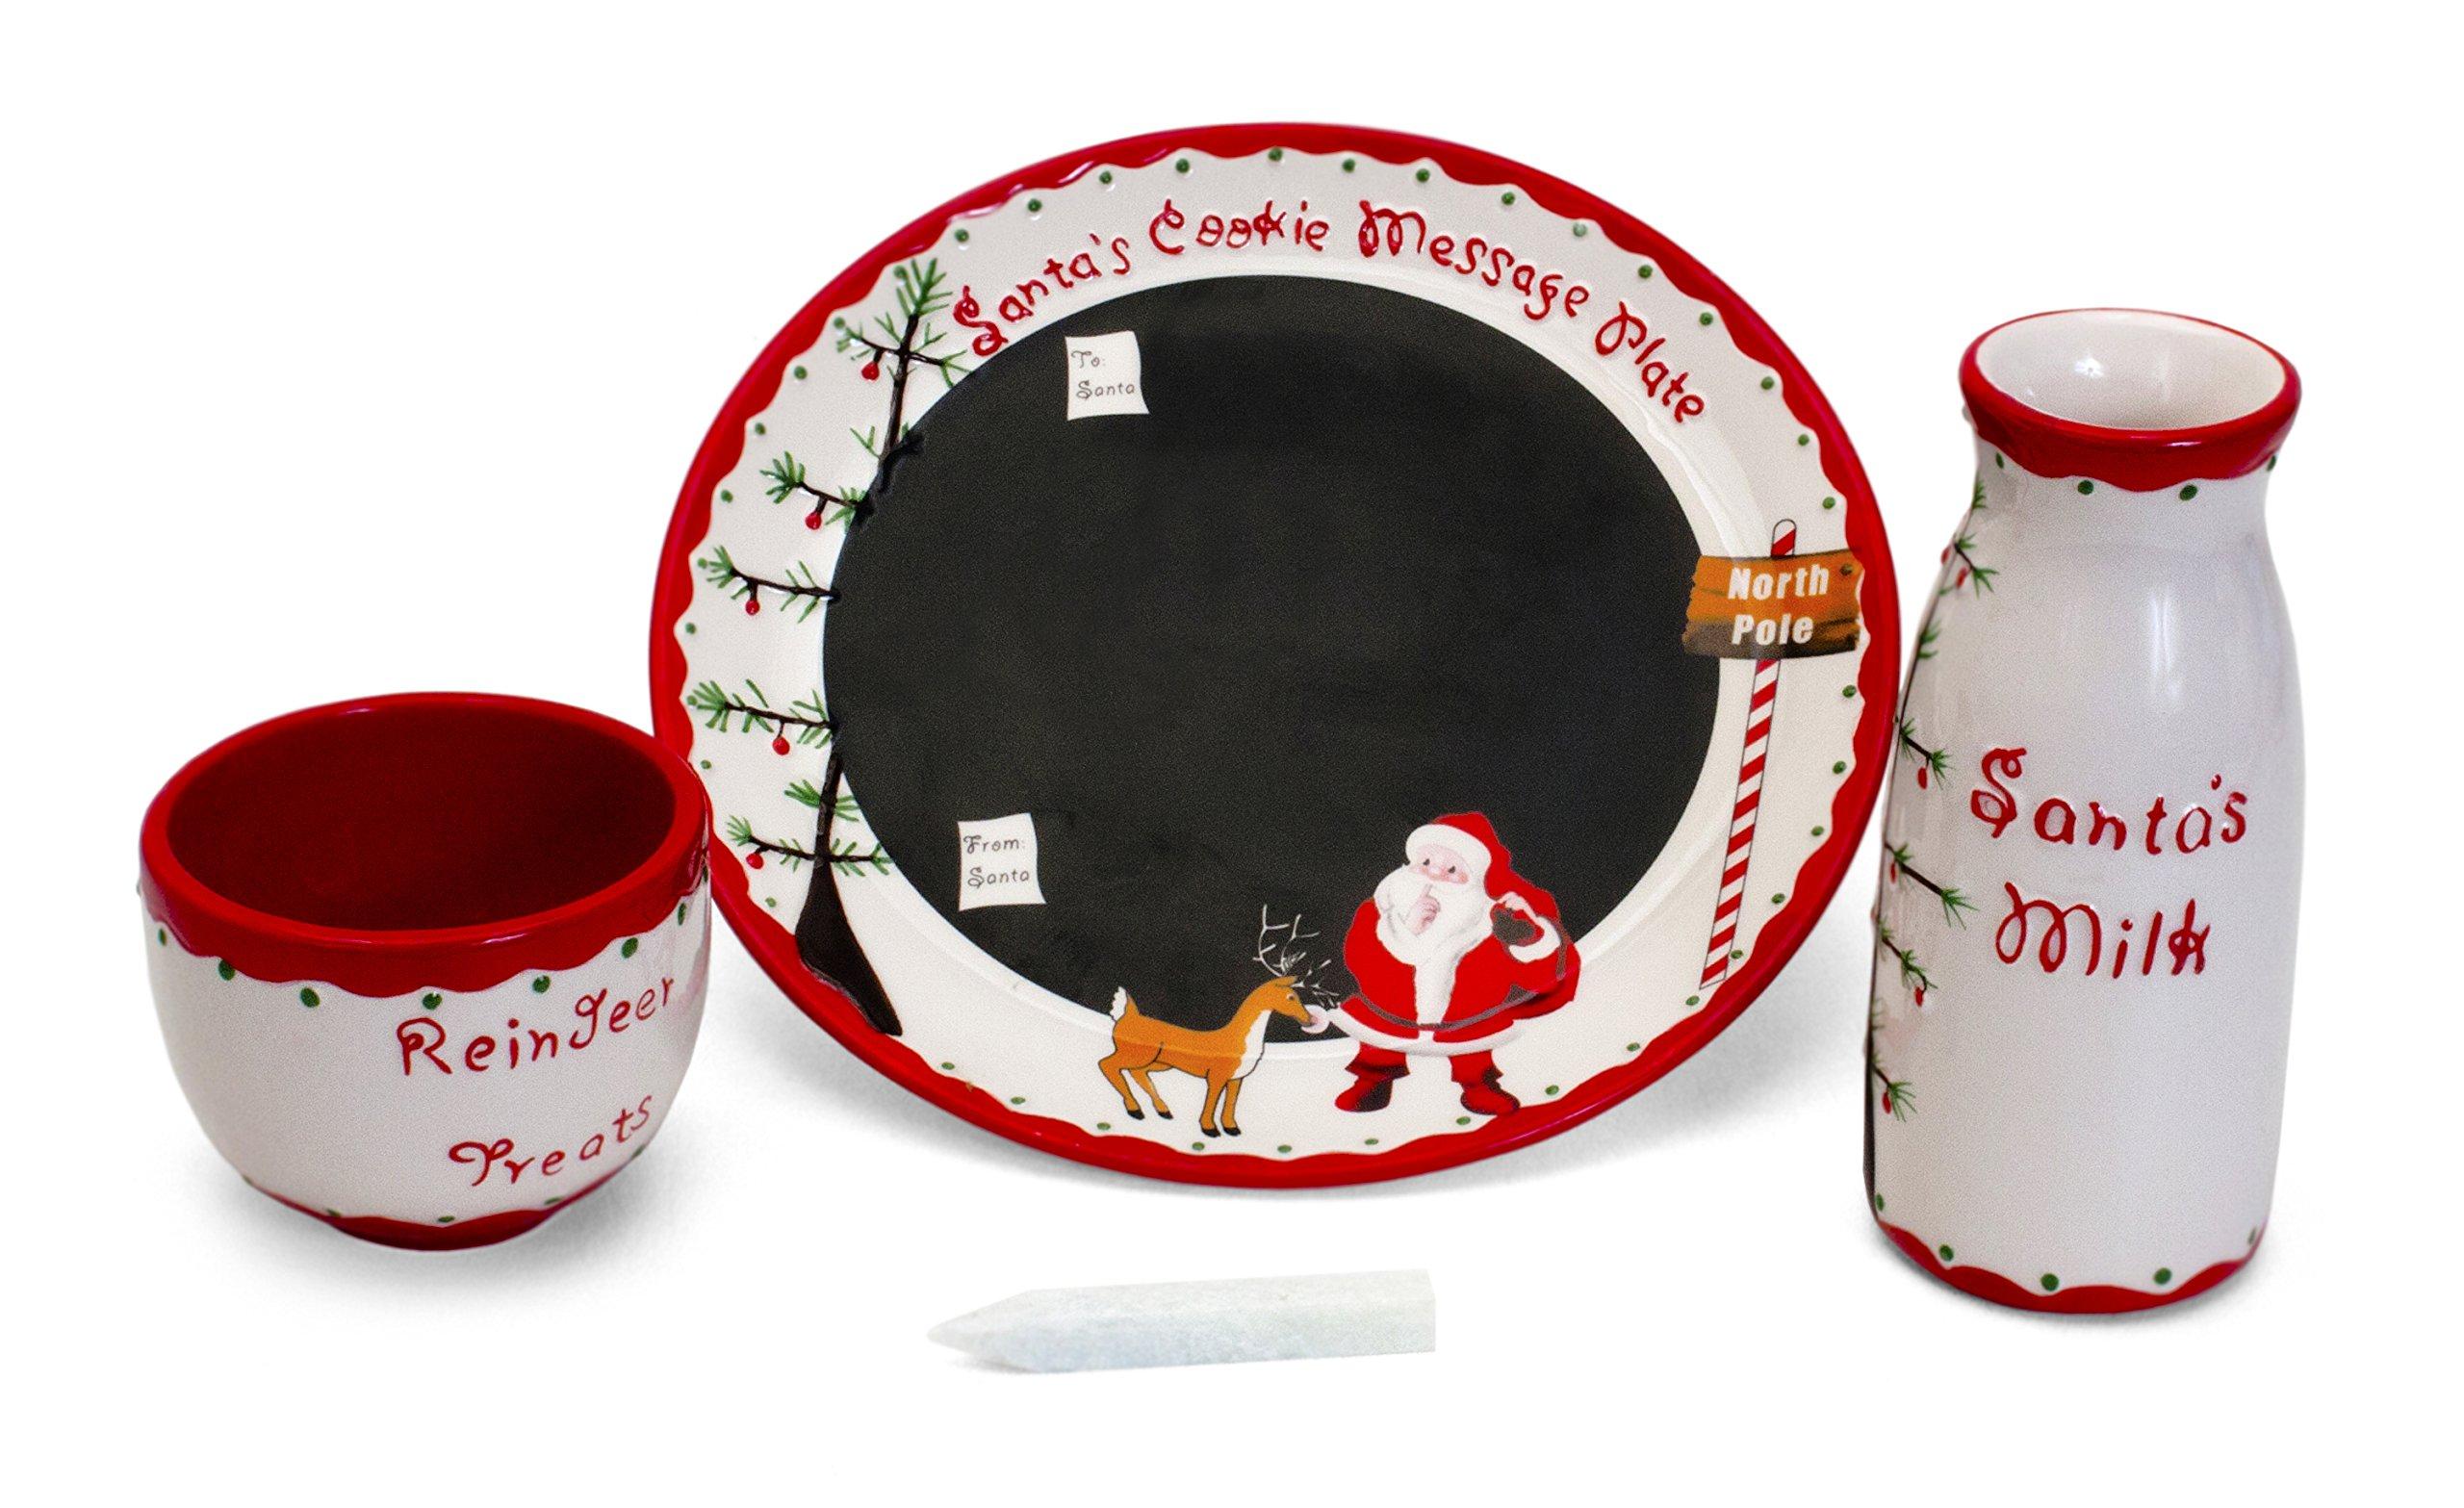 Child to Cherish Santa's Message Christmas Plate Set | Cookies for Santa Plate, Santa Milk jar, and Reindeer Treat Bowl